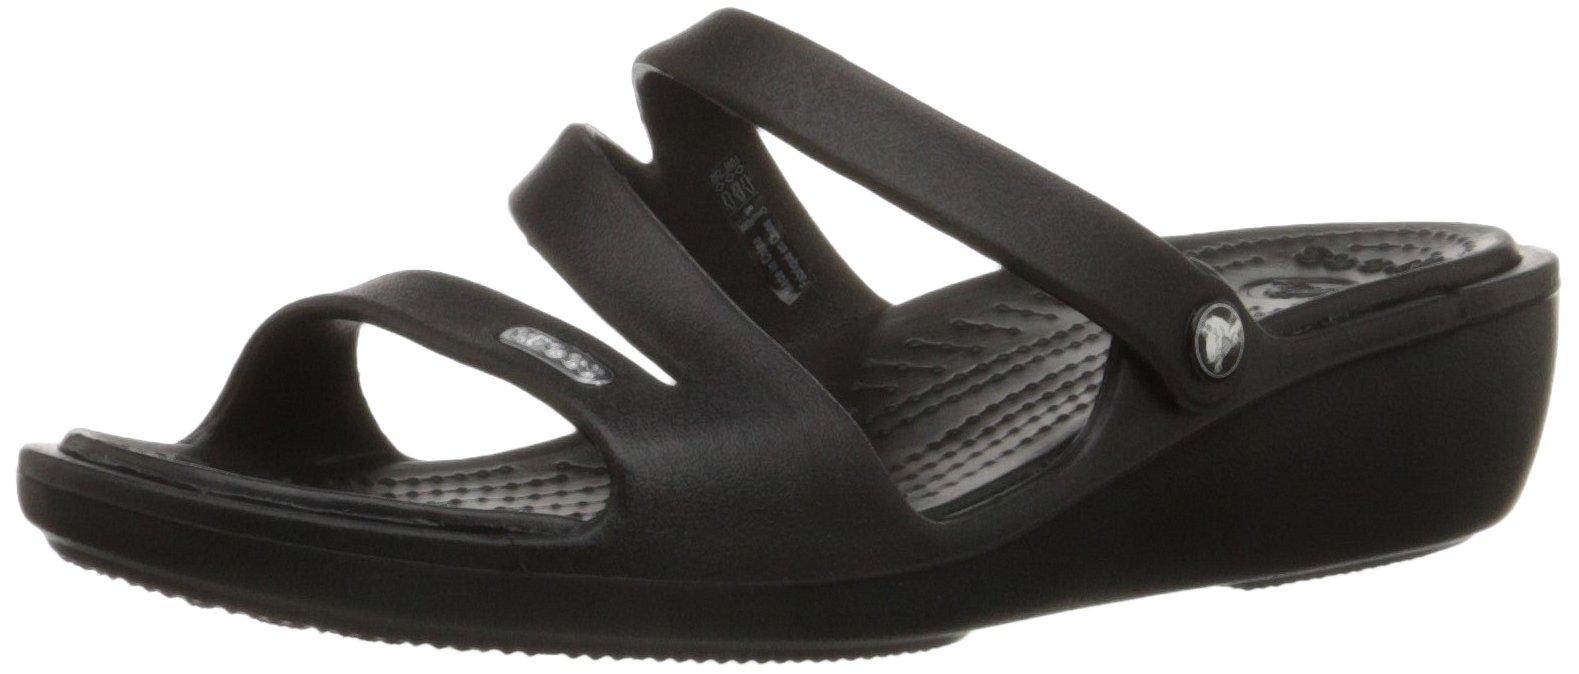 Crocs Women's Patricia Mini Wedge, Black/Black, 7 M